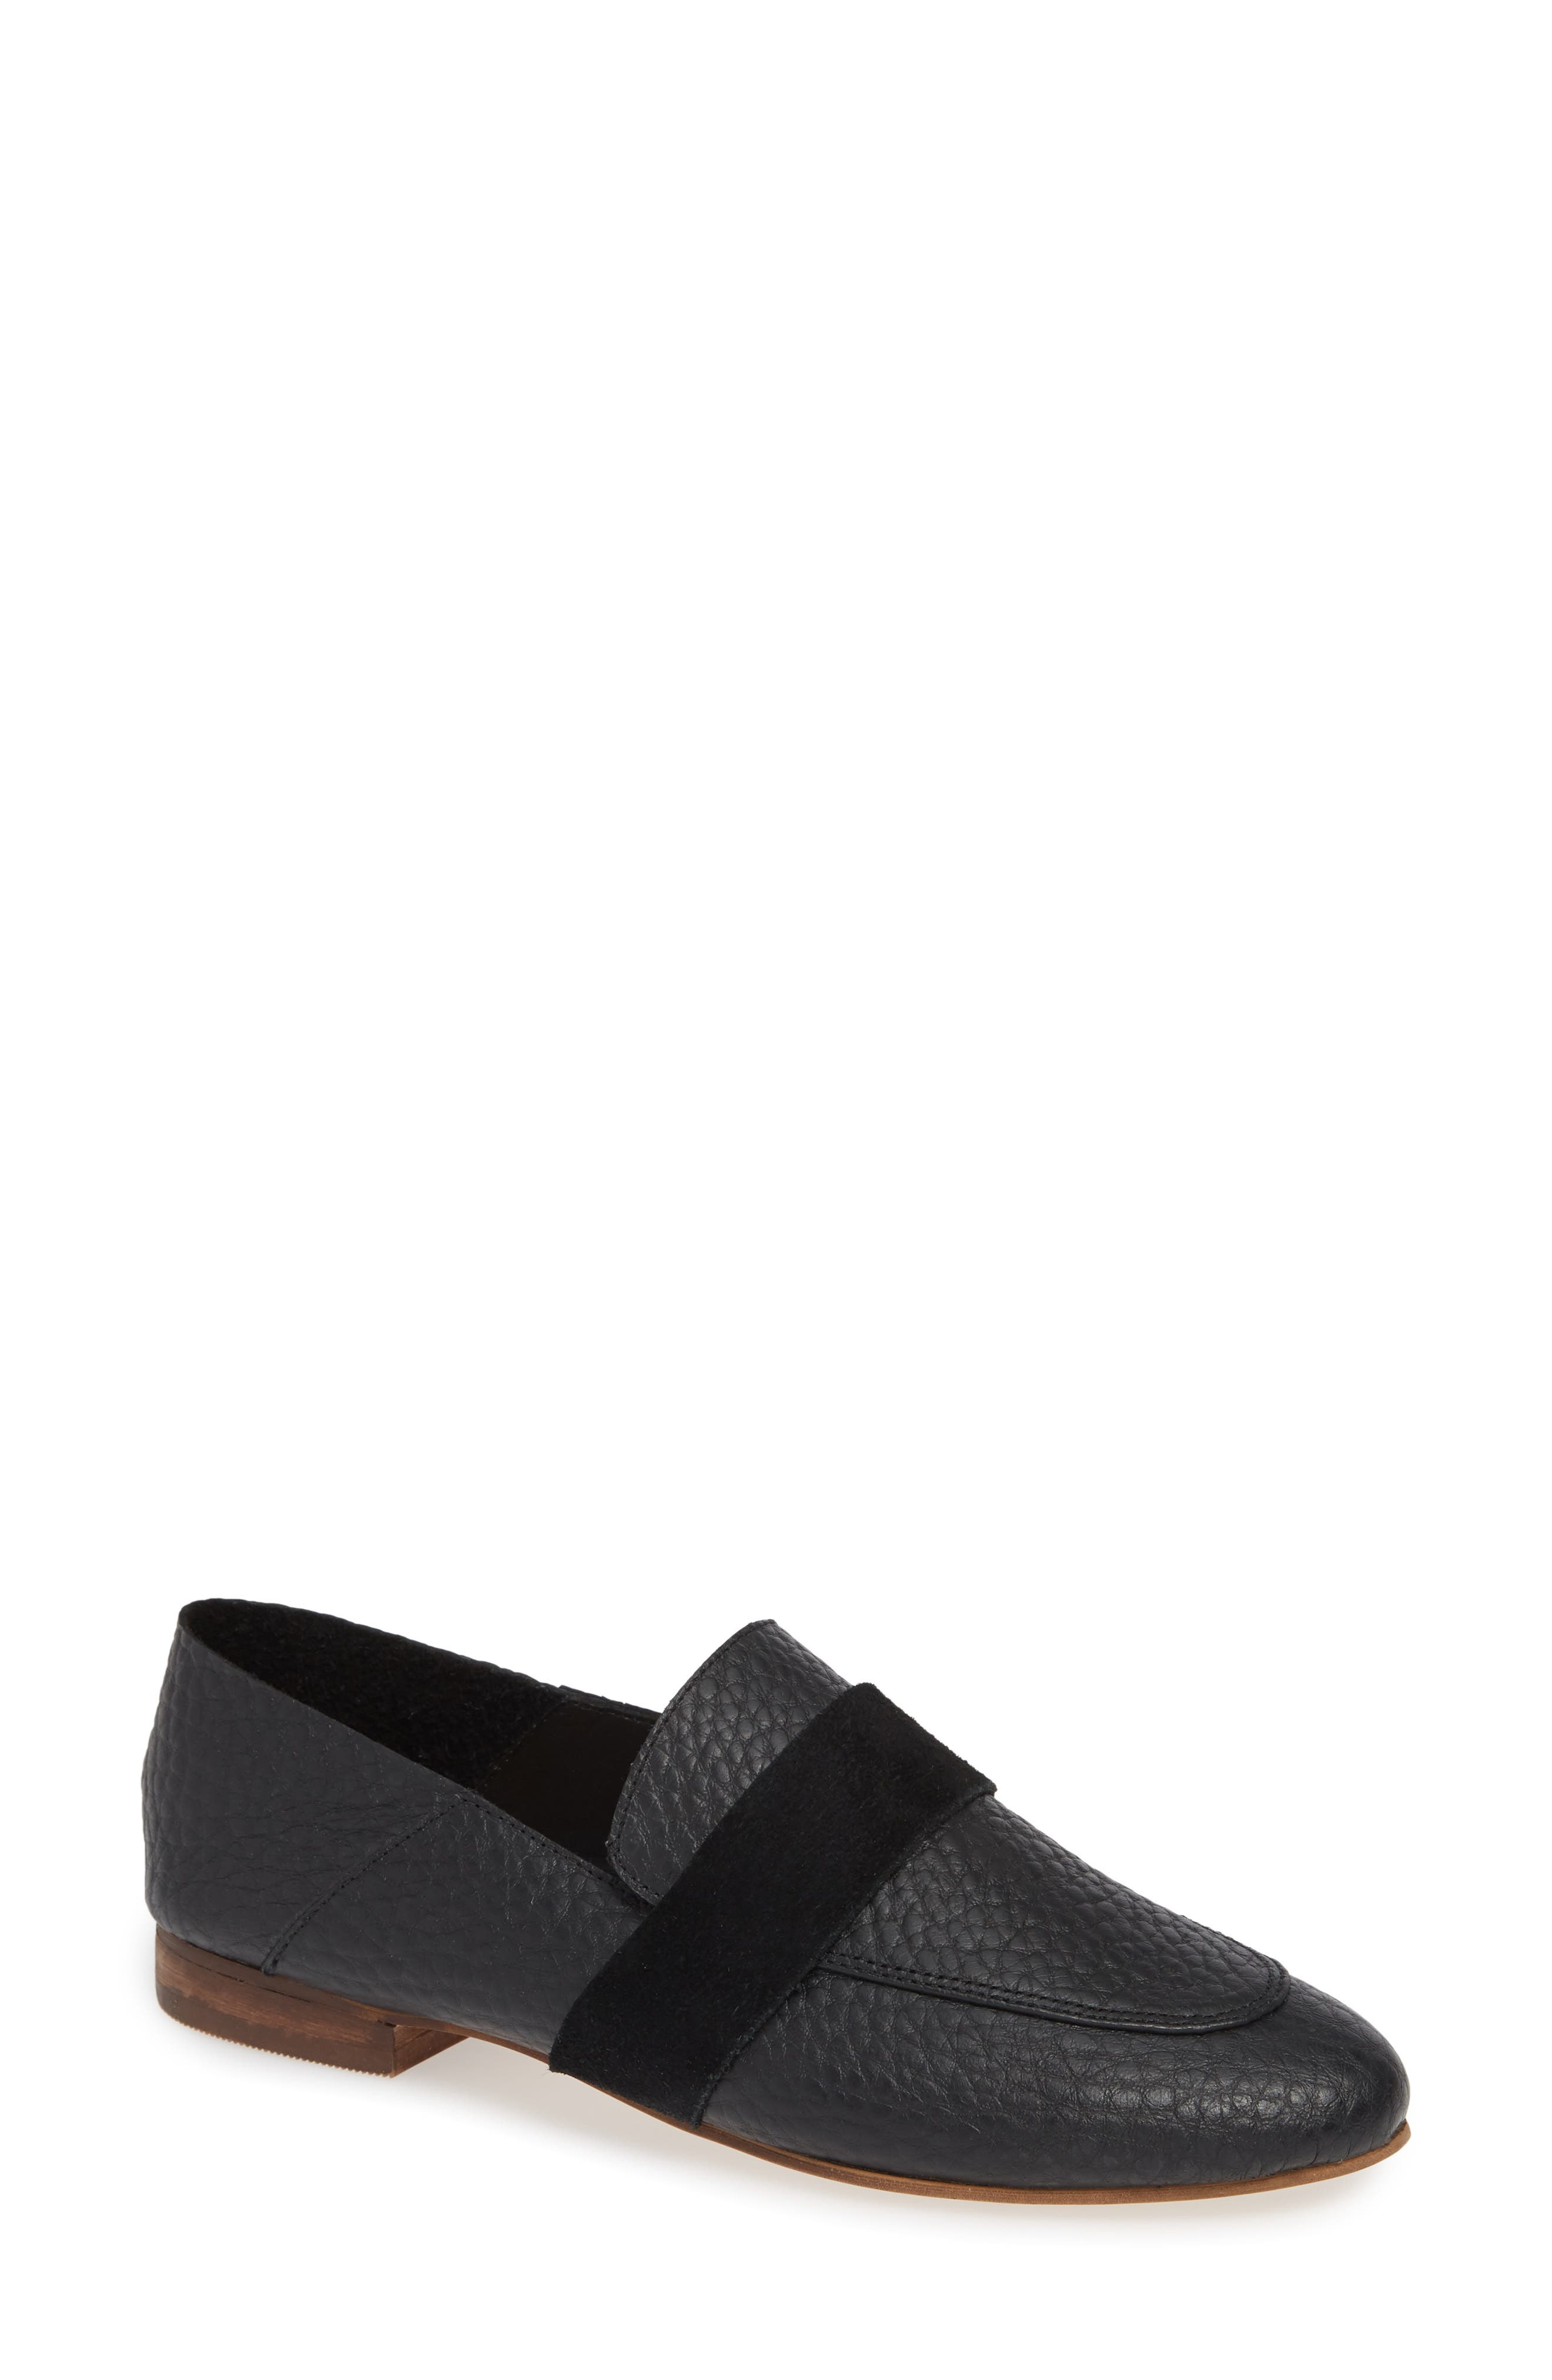 KAANAS Amalfi Loafer in Black